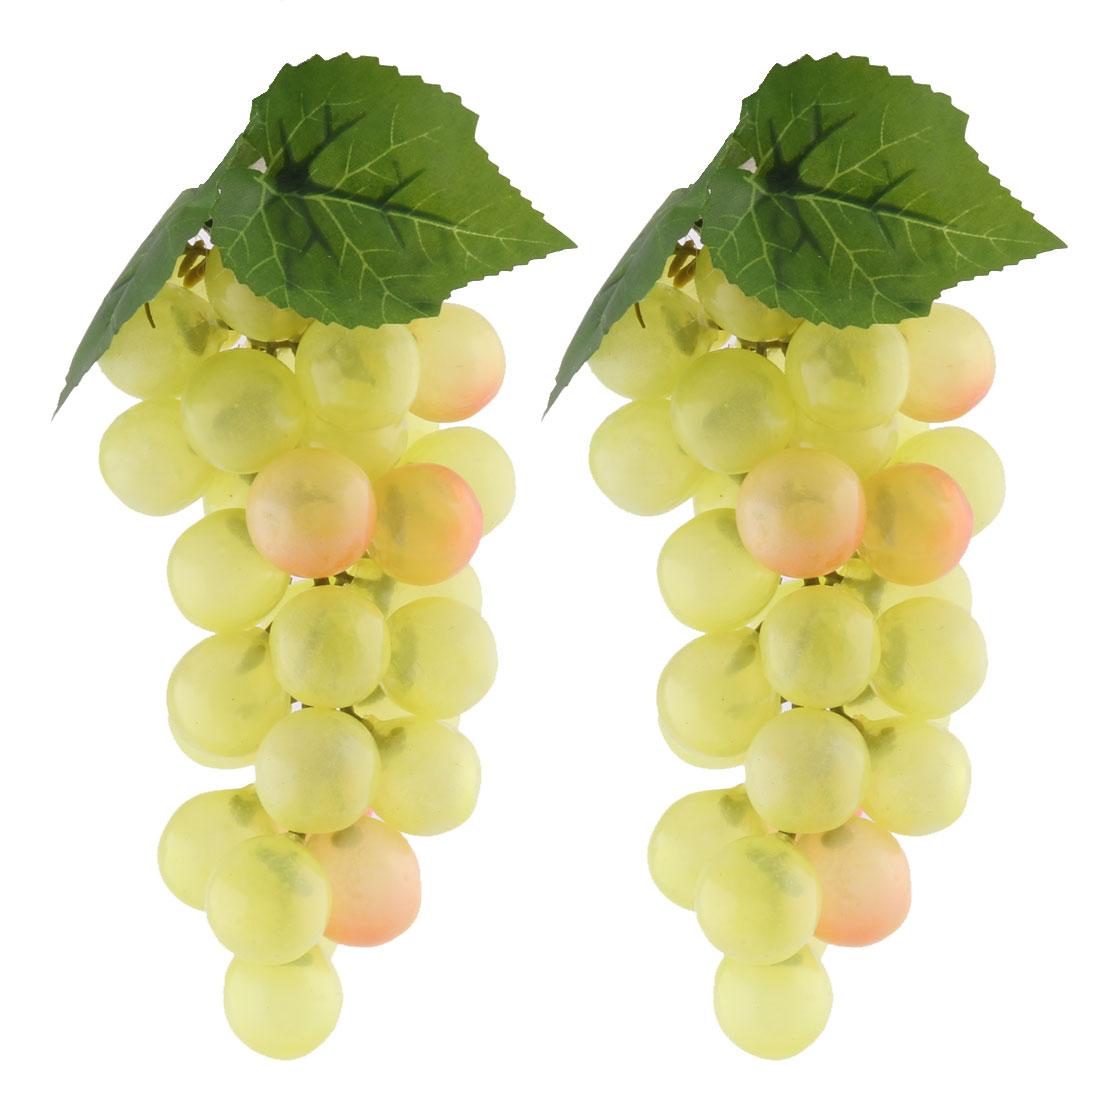 Home Desk Decor Plastic Artificial Grape Designed Emulation Fruit Light Yellow 2pcs